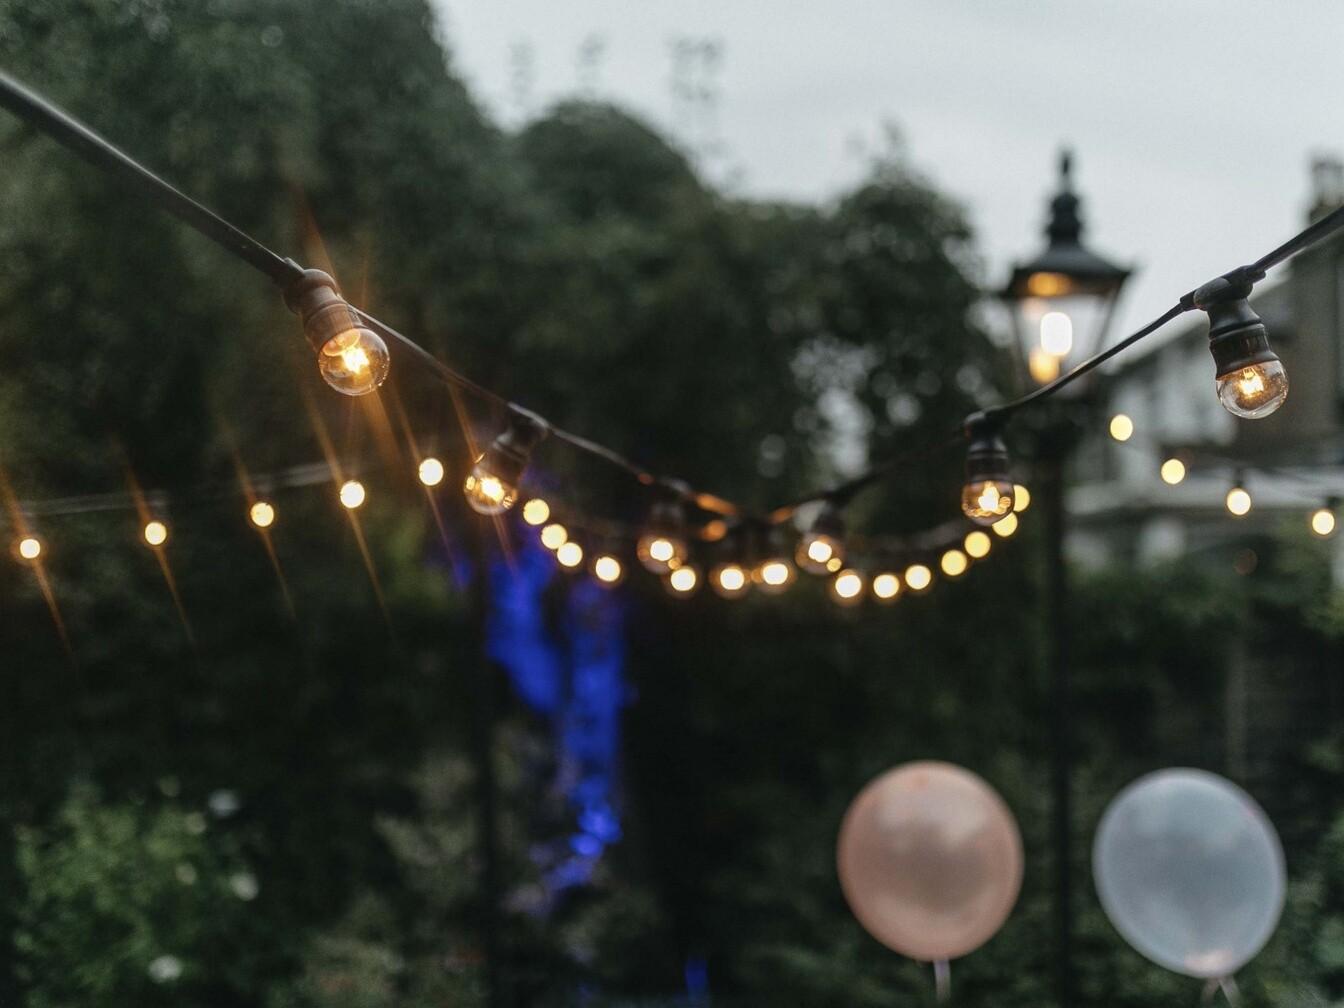 garden festoon lighting